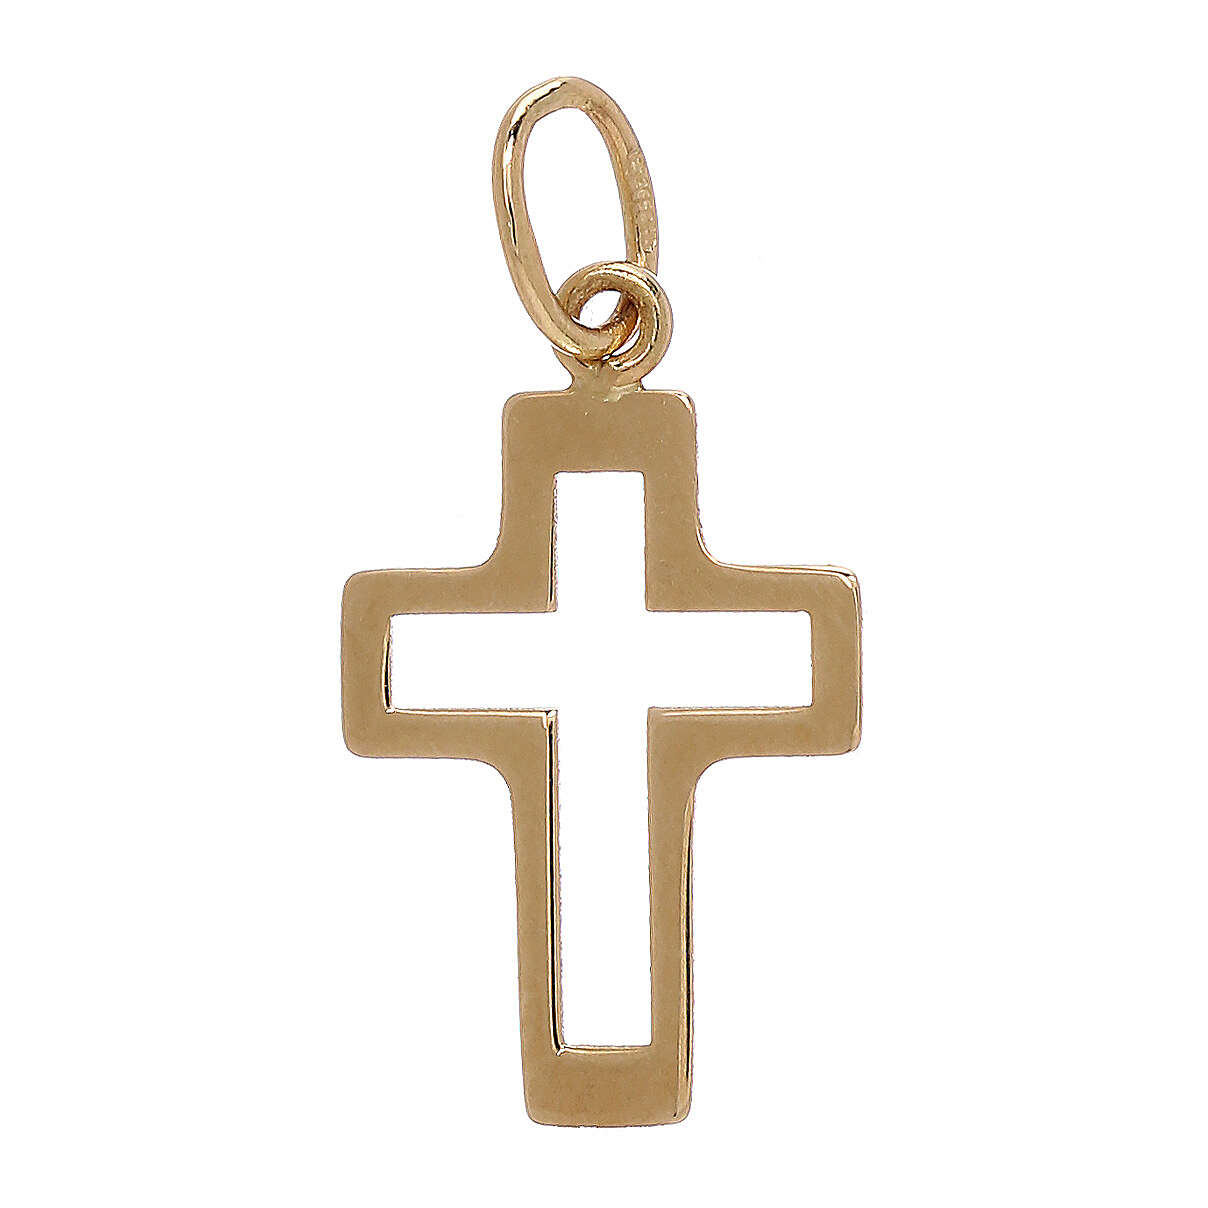 Colgante perfil cruz perforado oro amarillo 18 k 0,35 gr 4